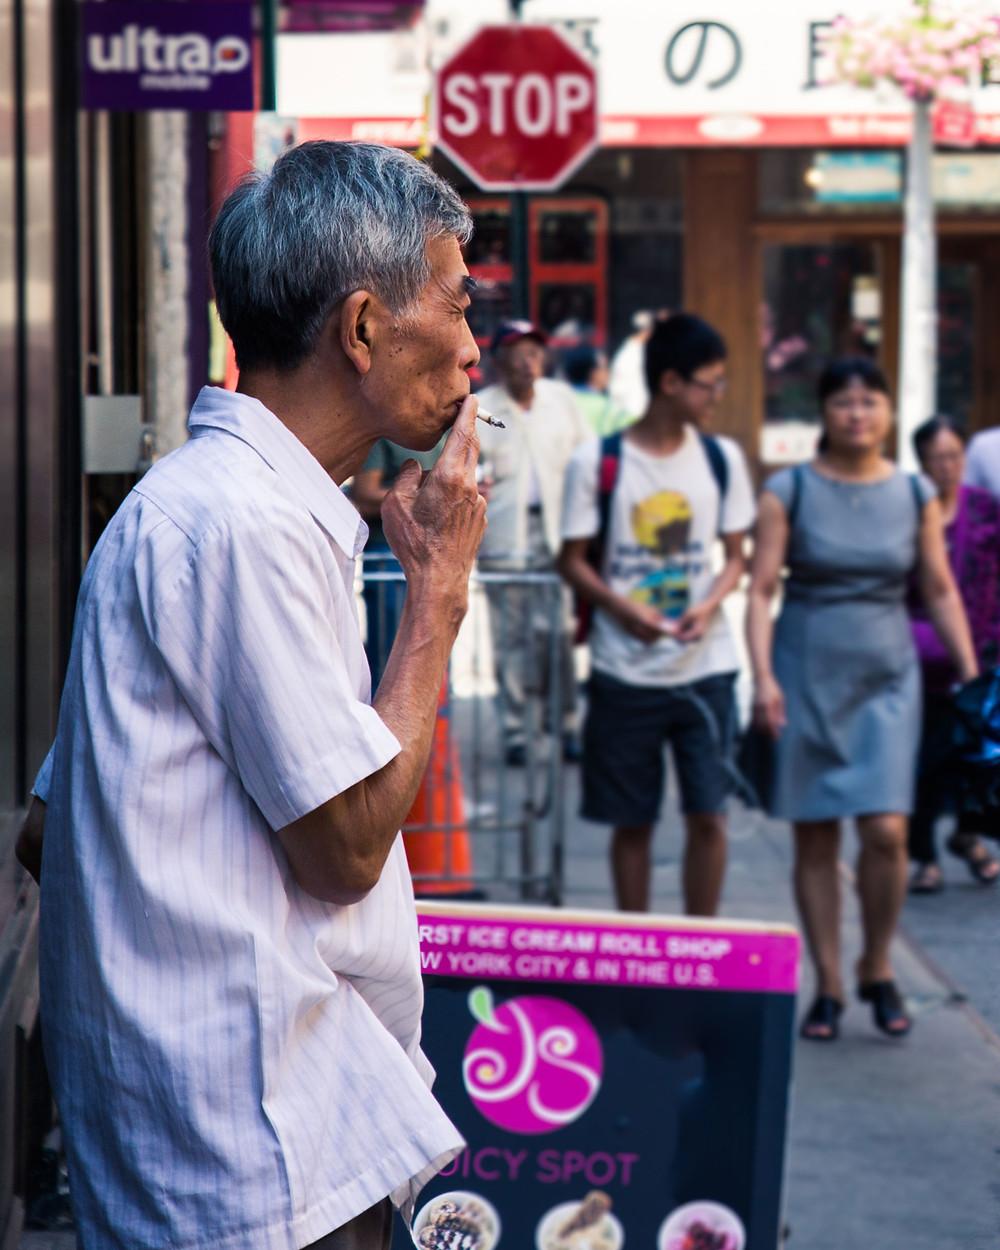 Elderly Chinese Man having a smoke break in Chinatown, Manhattan